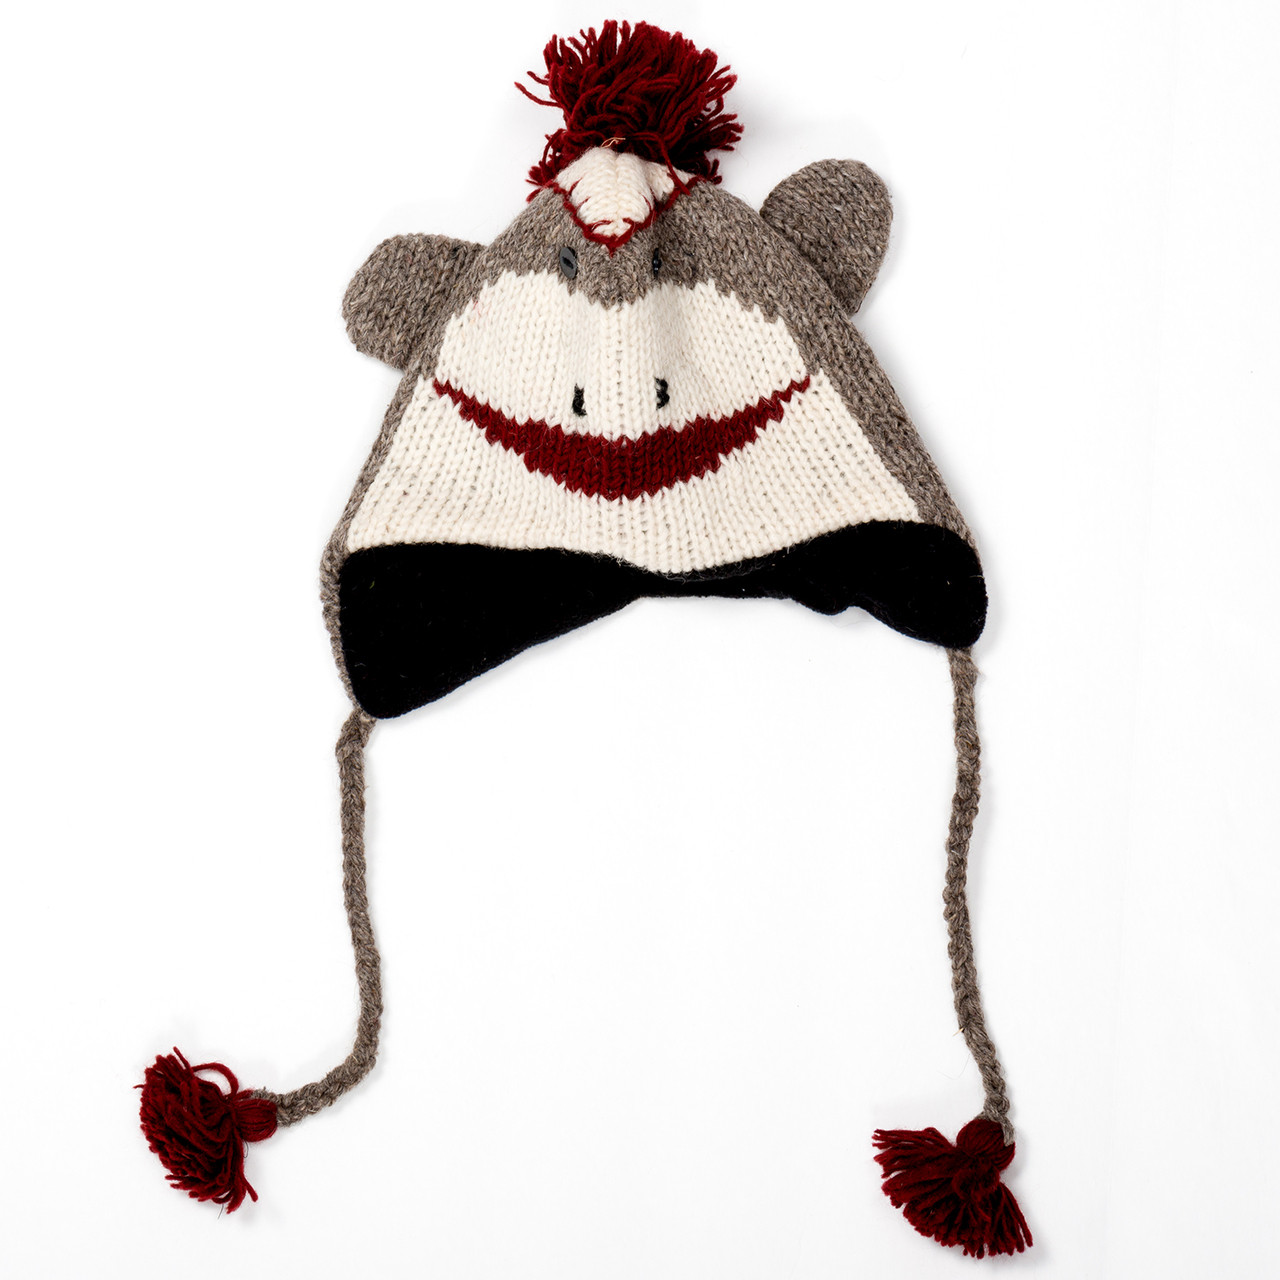 Knit Sock Monkey Hat - Adult Size - RetroFestive.ca 7aeb14eeead9